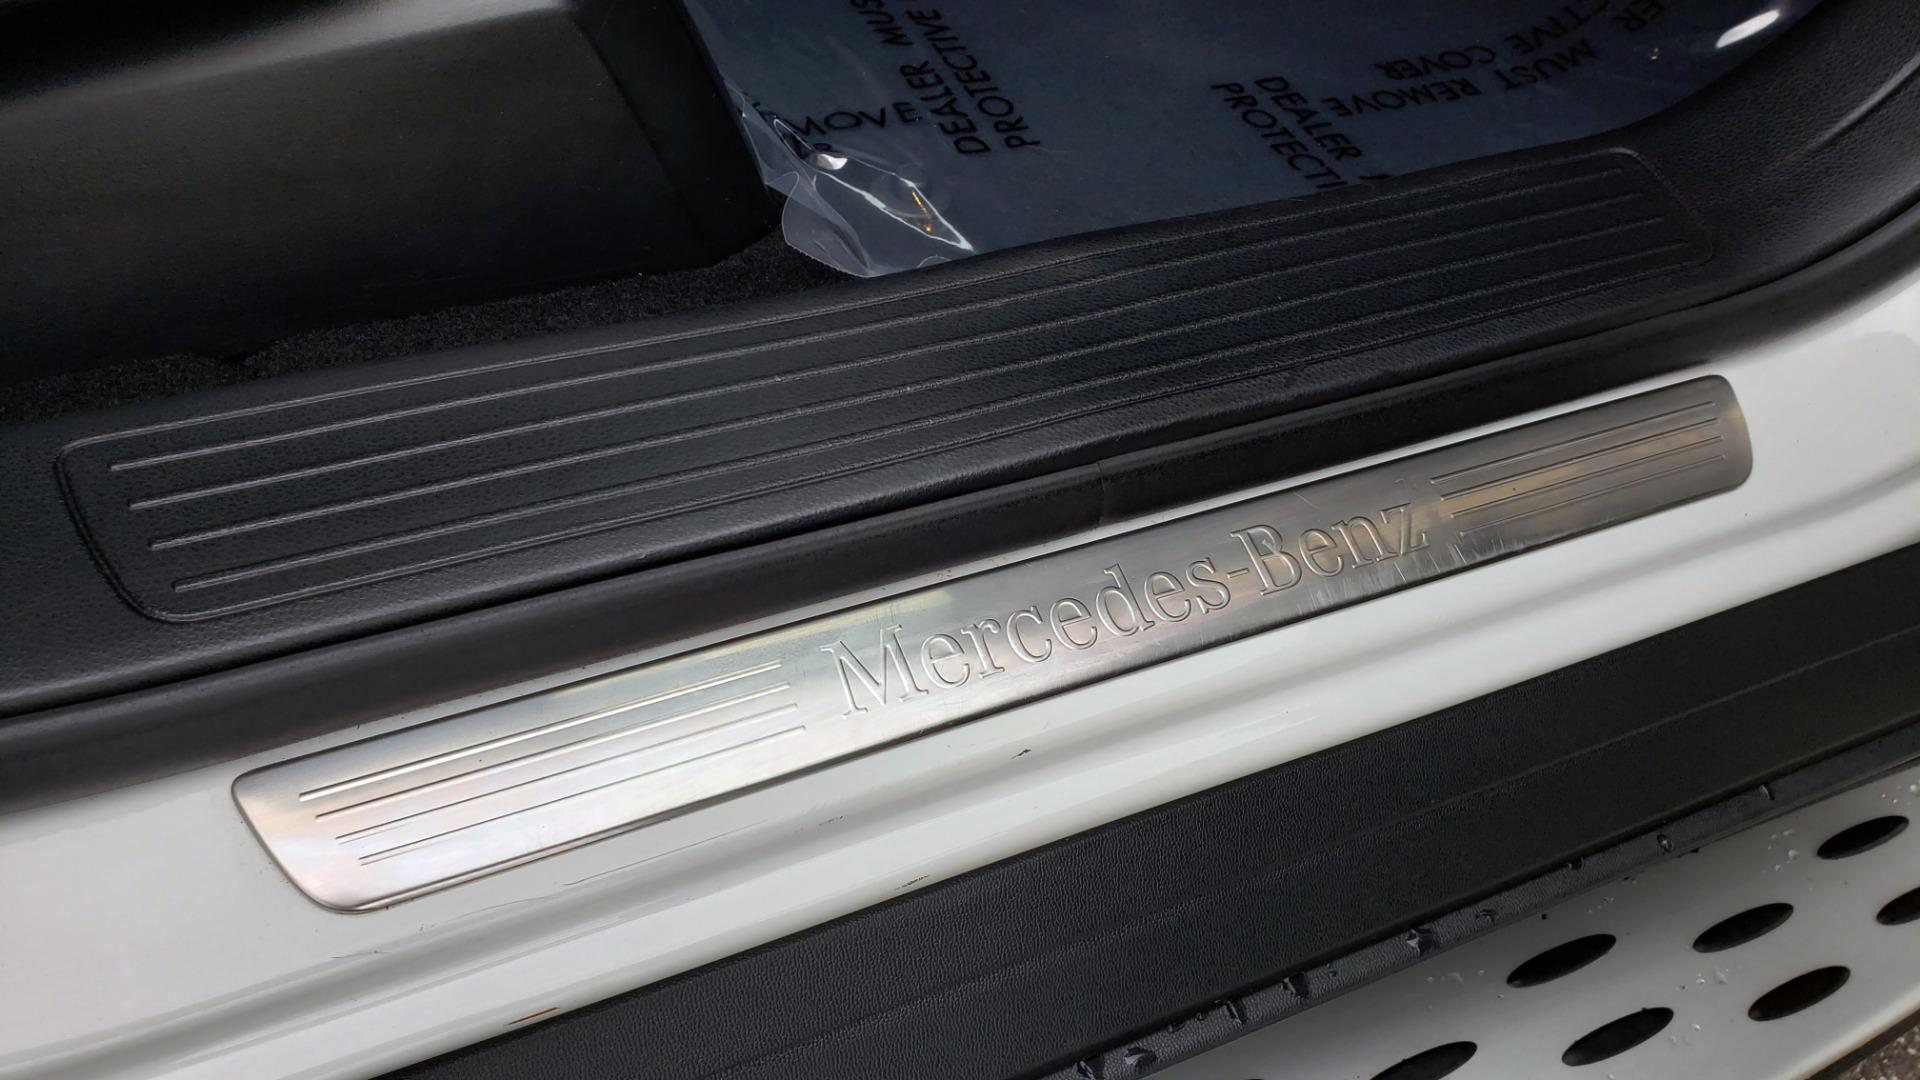 Used 2018 Mercedes-Benz GLE 350 4MATIC / PREM PKG / NAV / PARK ASST / K/H SND / HITCH / REARVIEW for sale $40,801 at Formula Imports in Charlotte NC 28227 70